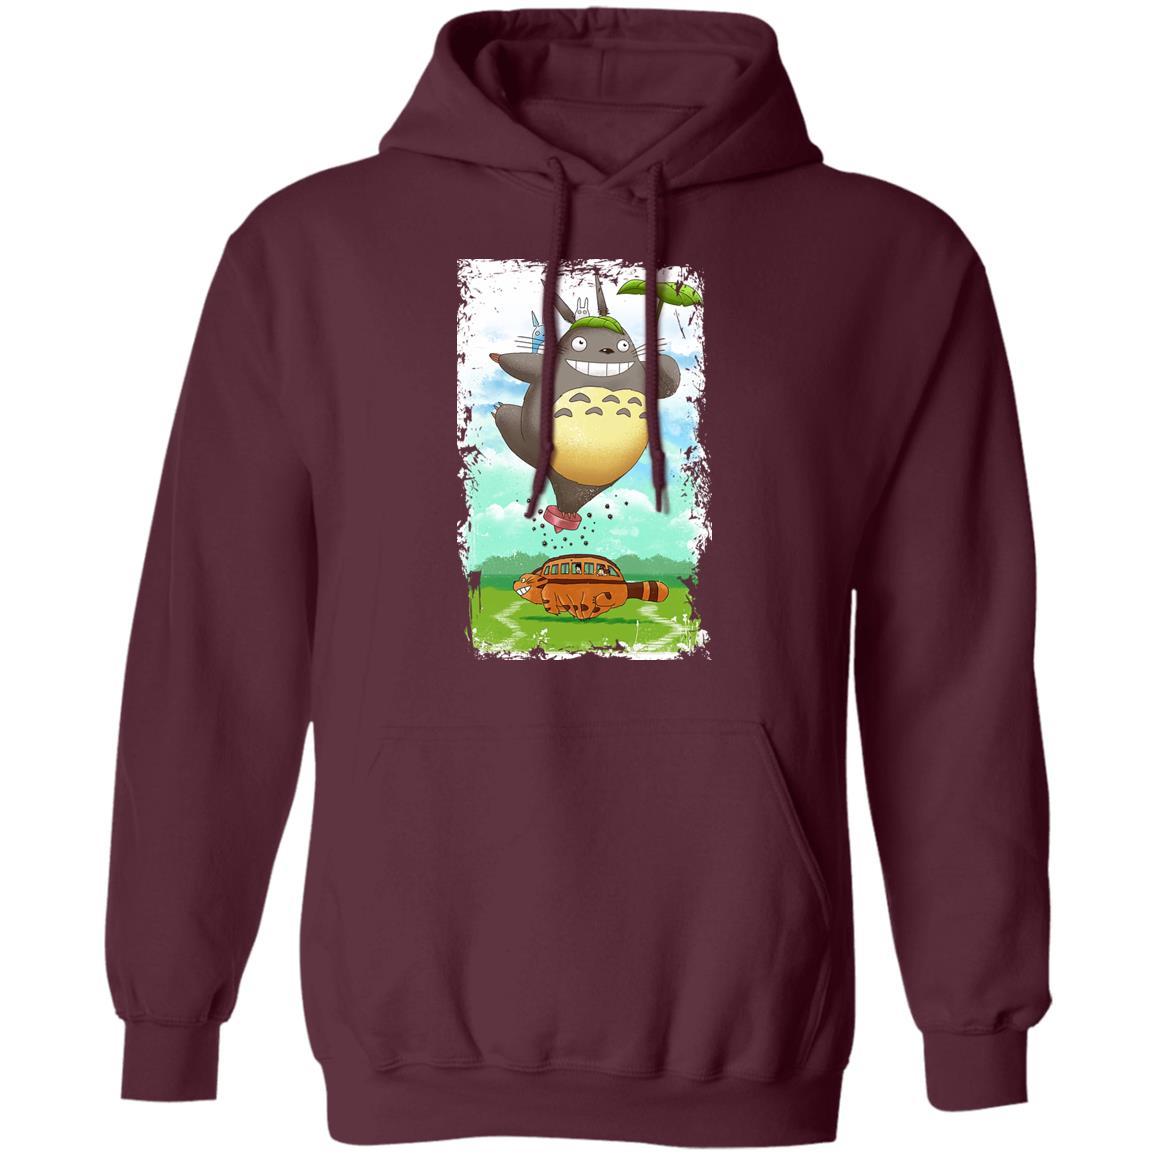 Totoro the Funny Neighbor Hoodie